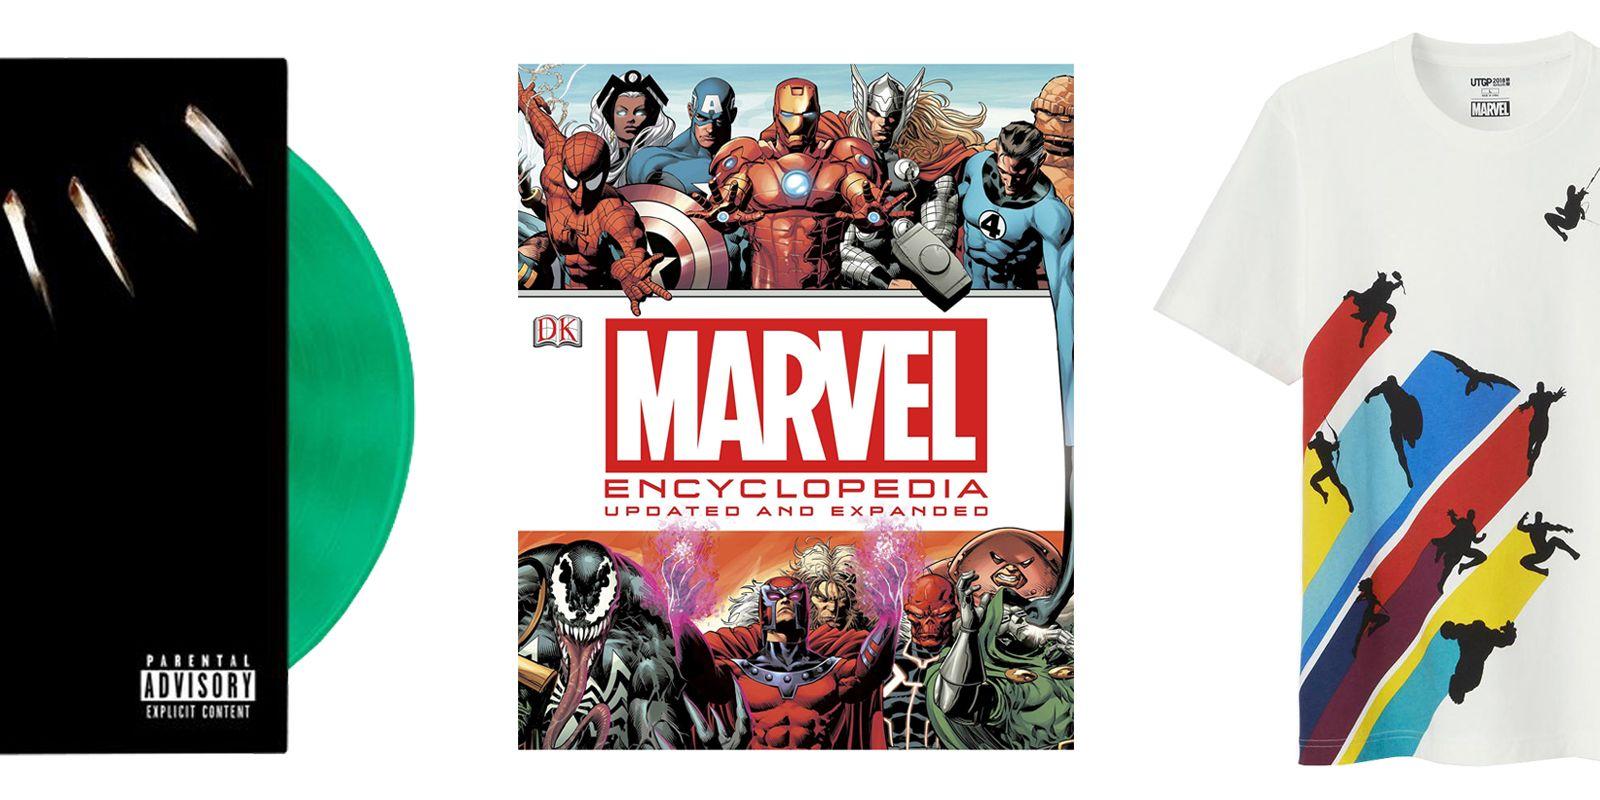 524edabdf87 15 Best Marvel Gifts 2018 for Marvel Cinematic Universe Movie Fans